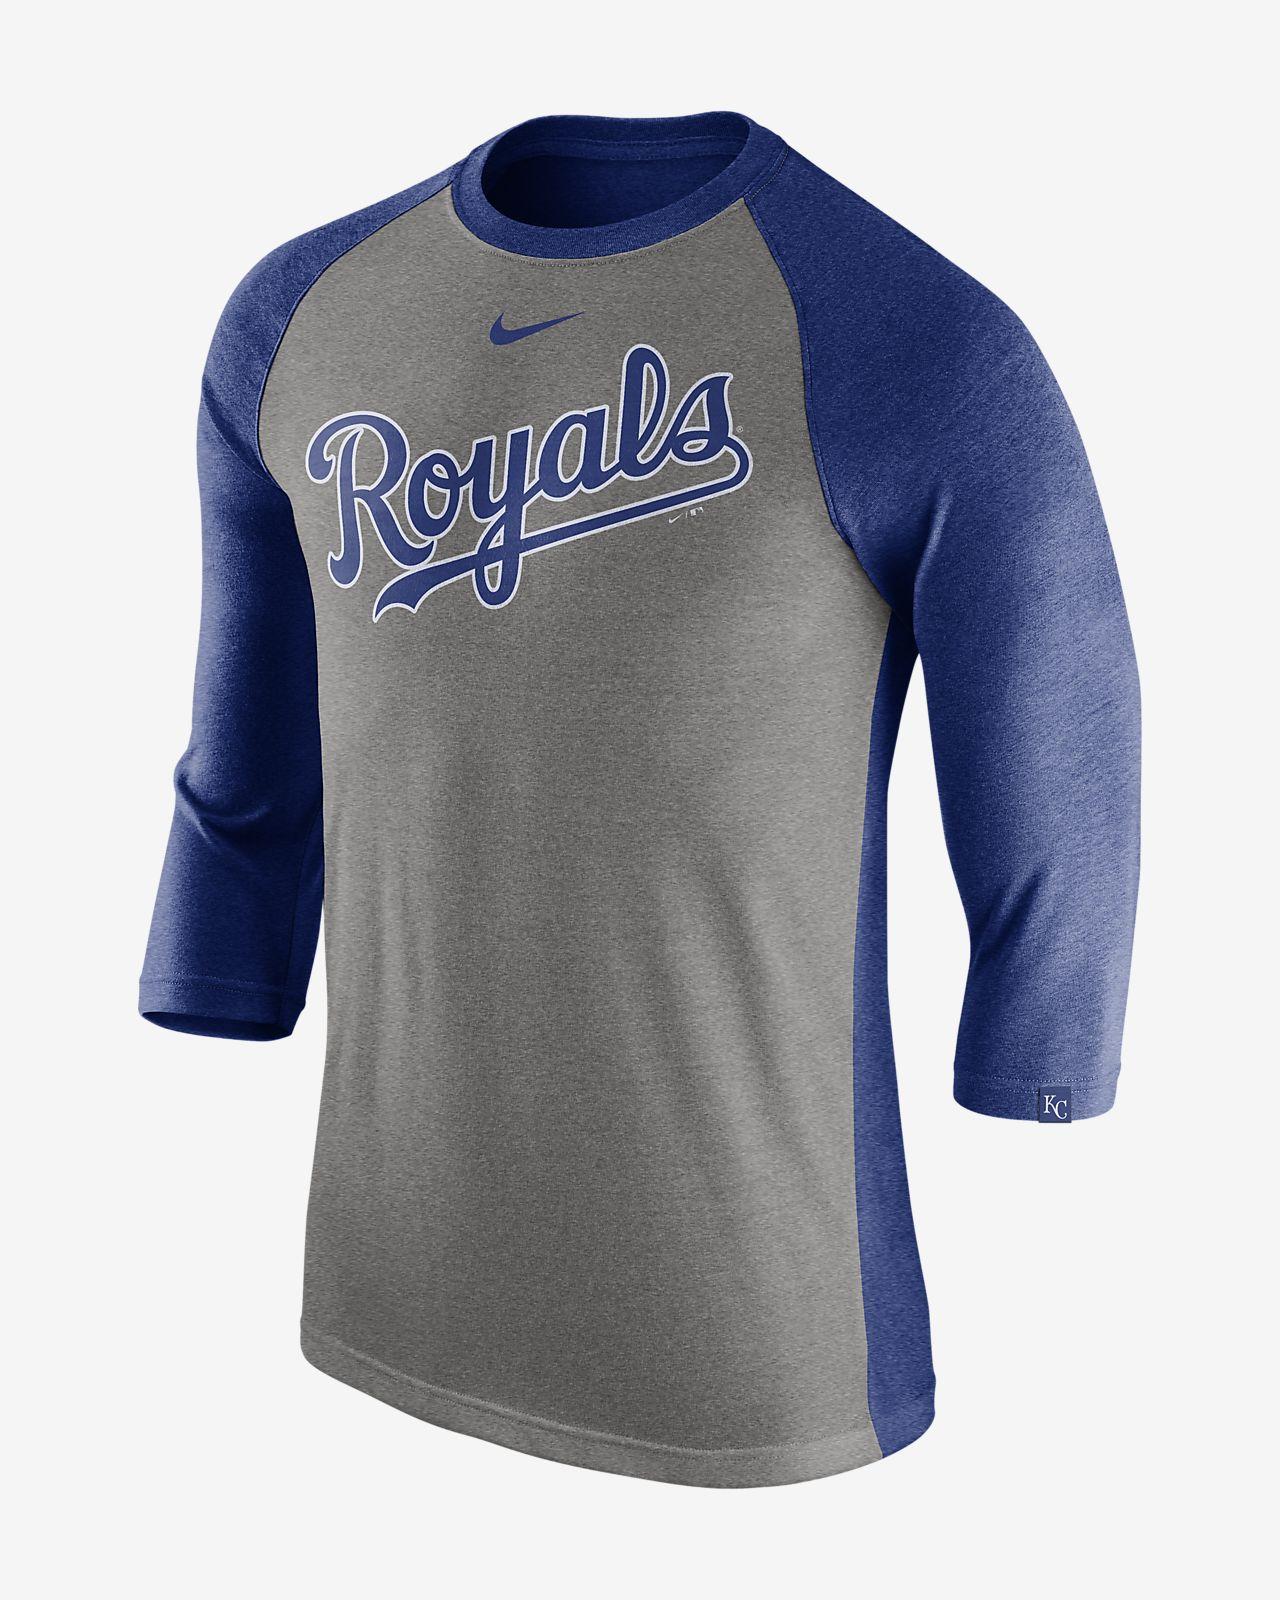 Nike Tri Raglan (MLB Royals) Men's 3/4 Sleeve Top